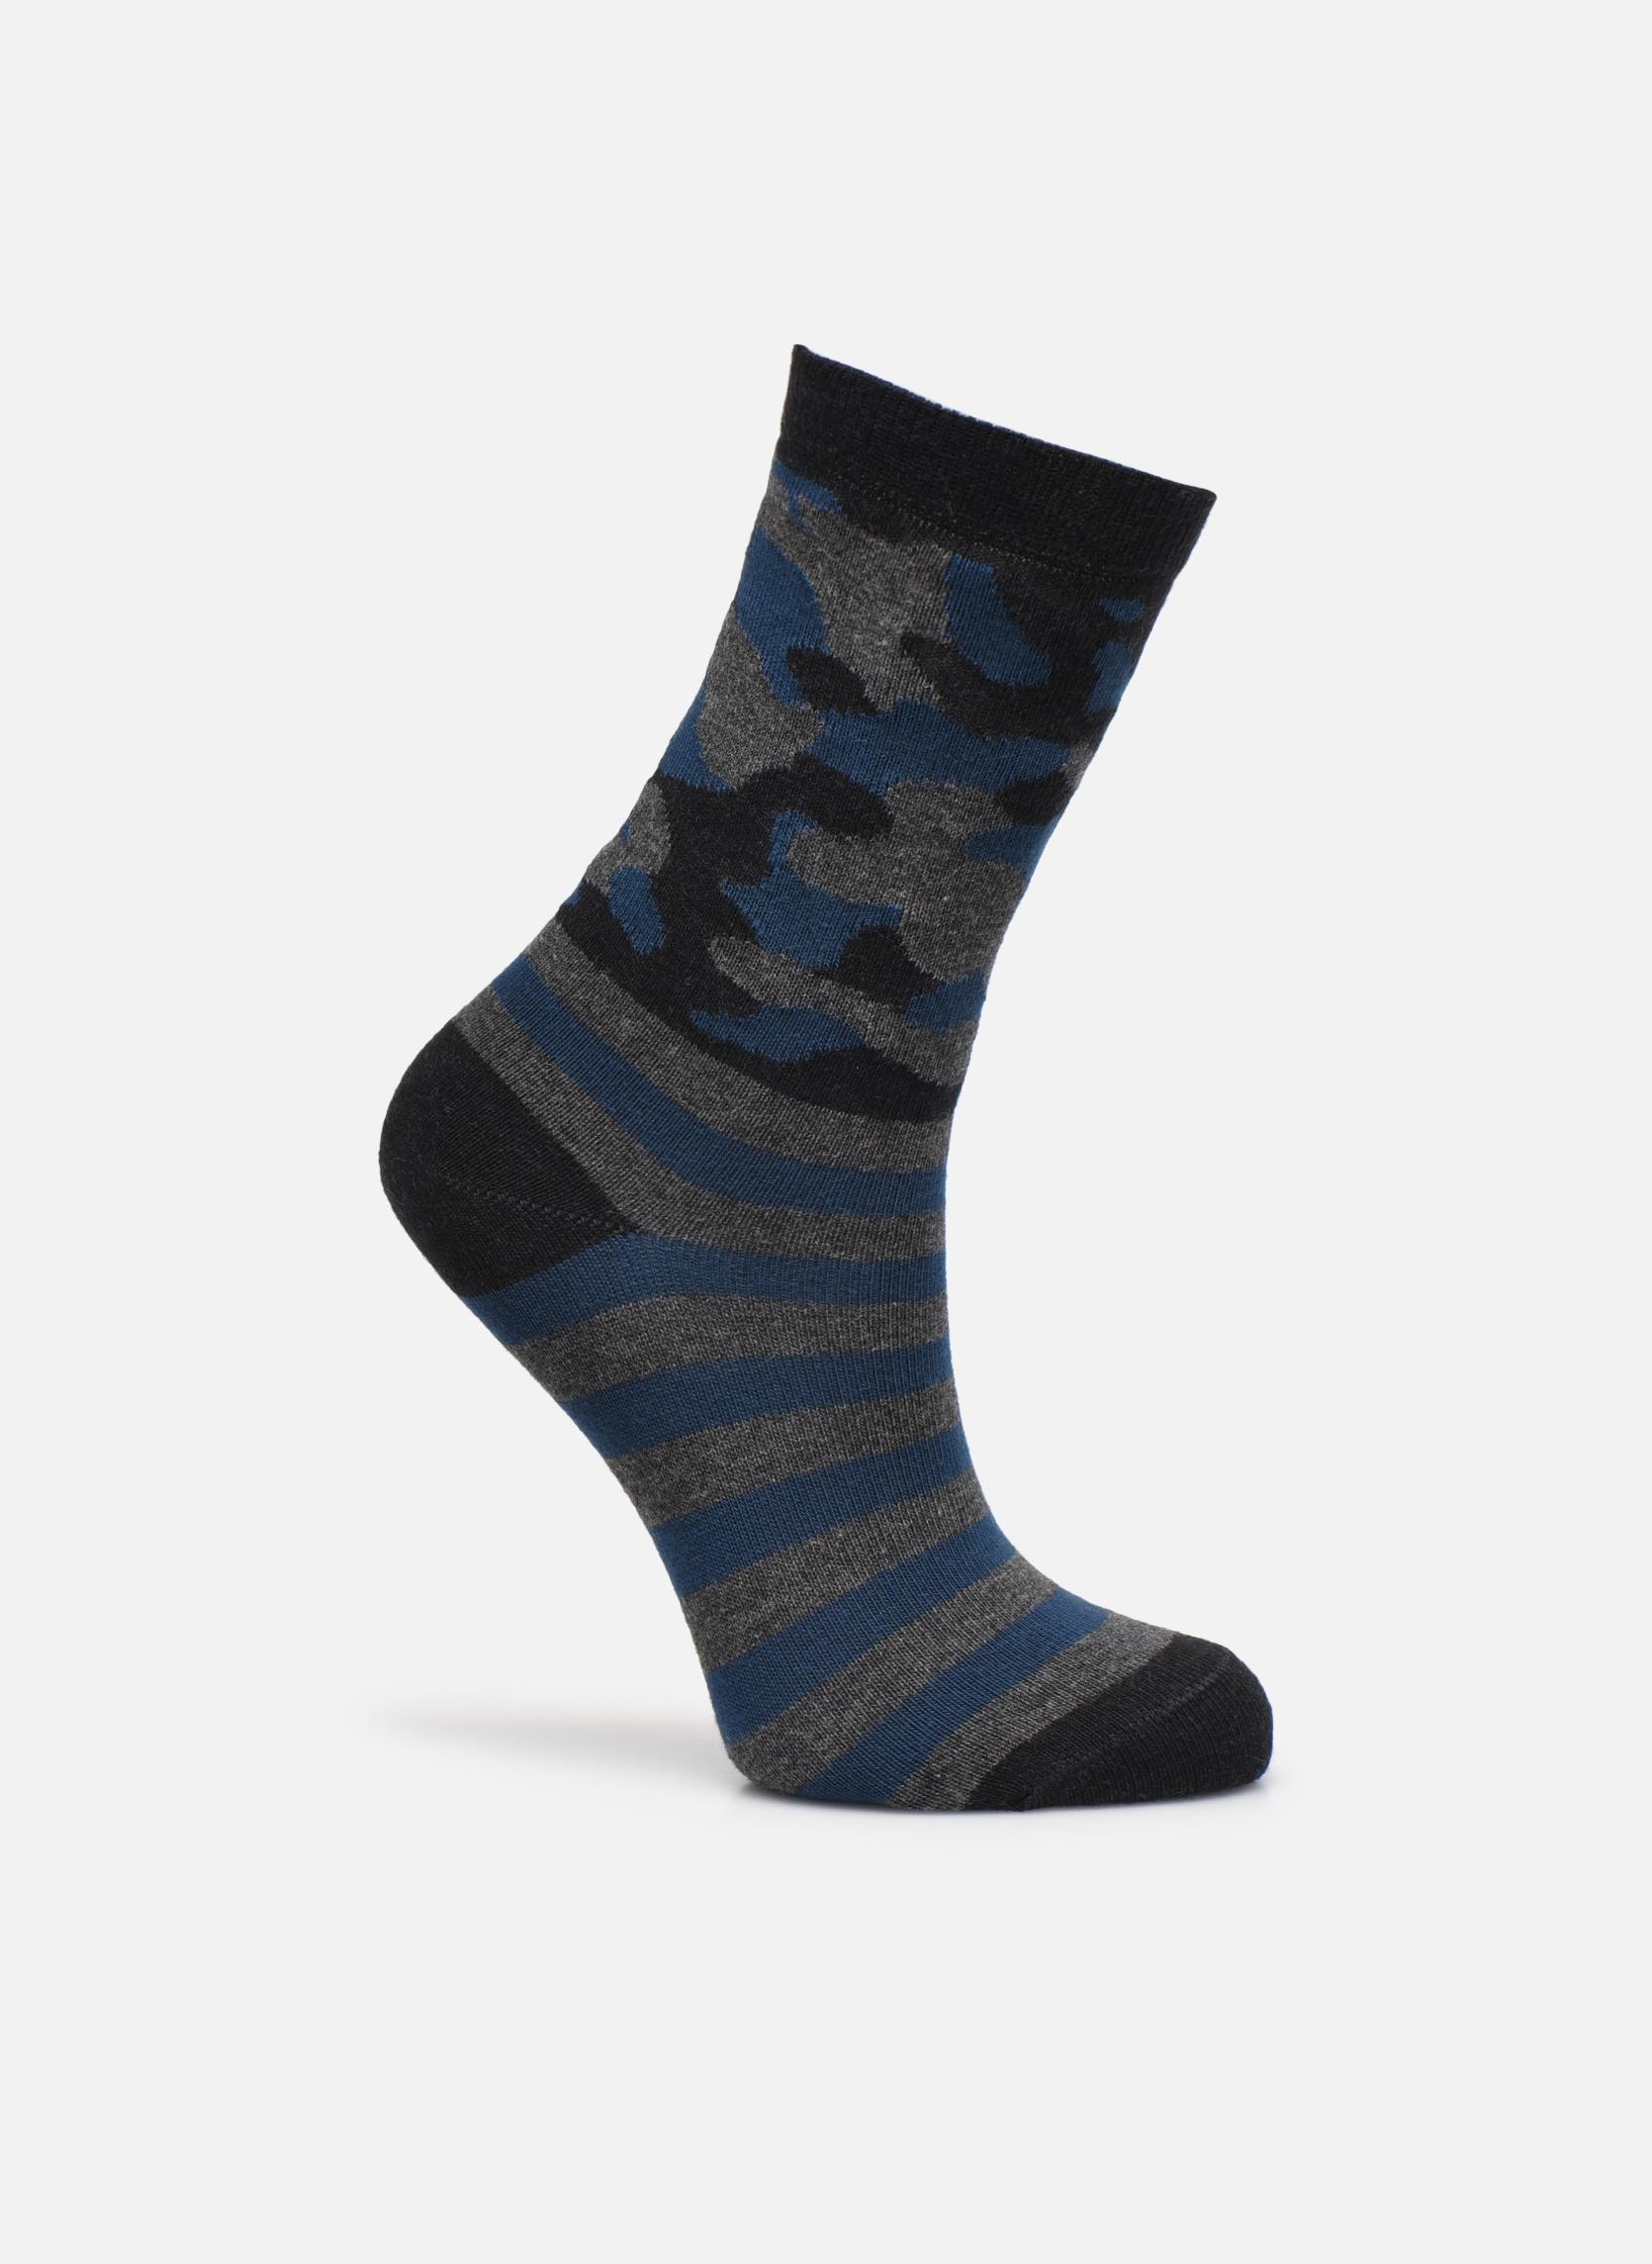 Calcetines ARMY 034 - gris / bleu